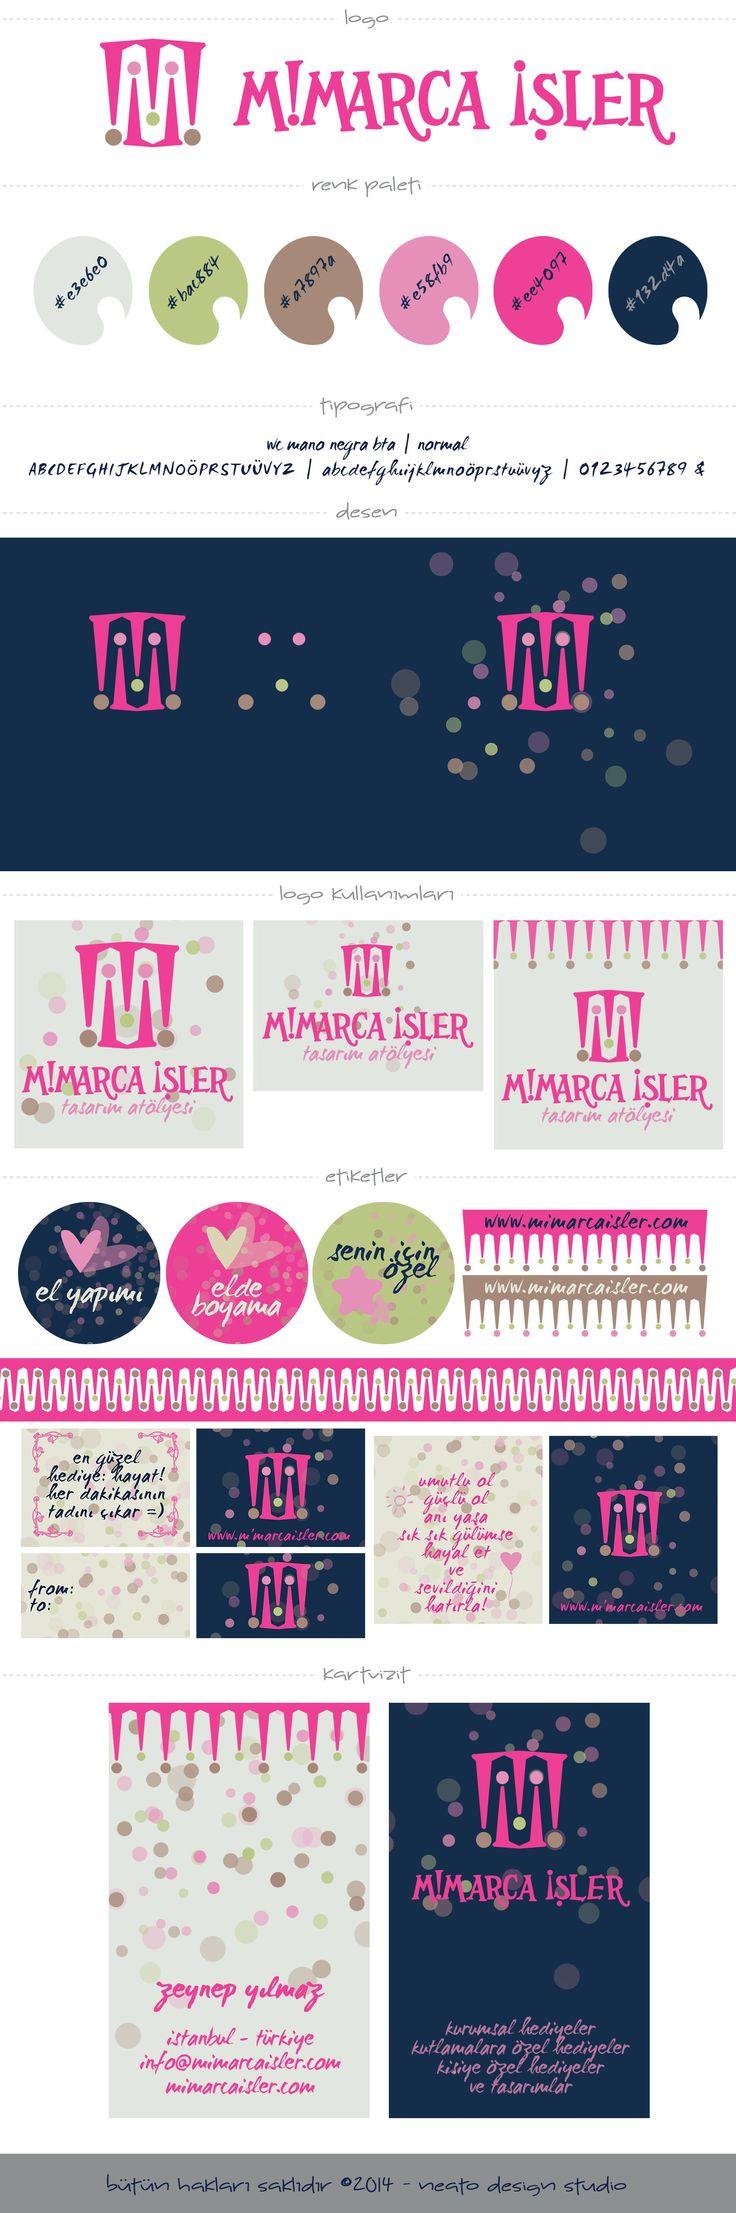 Mimarca İşler marka tasarımı #branding #concept #pink #pembe #marka #tasarım #dots #puantiye #cute #handmade #logo #desen #texture #businesscard #kartvizit